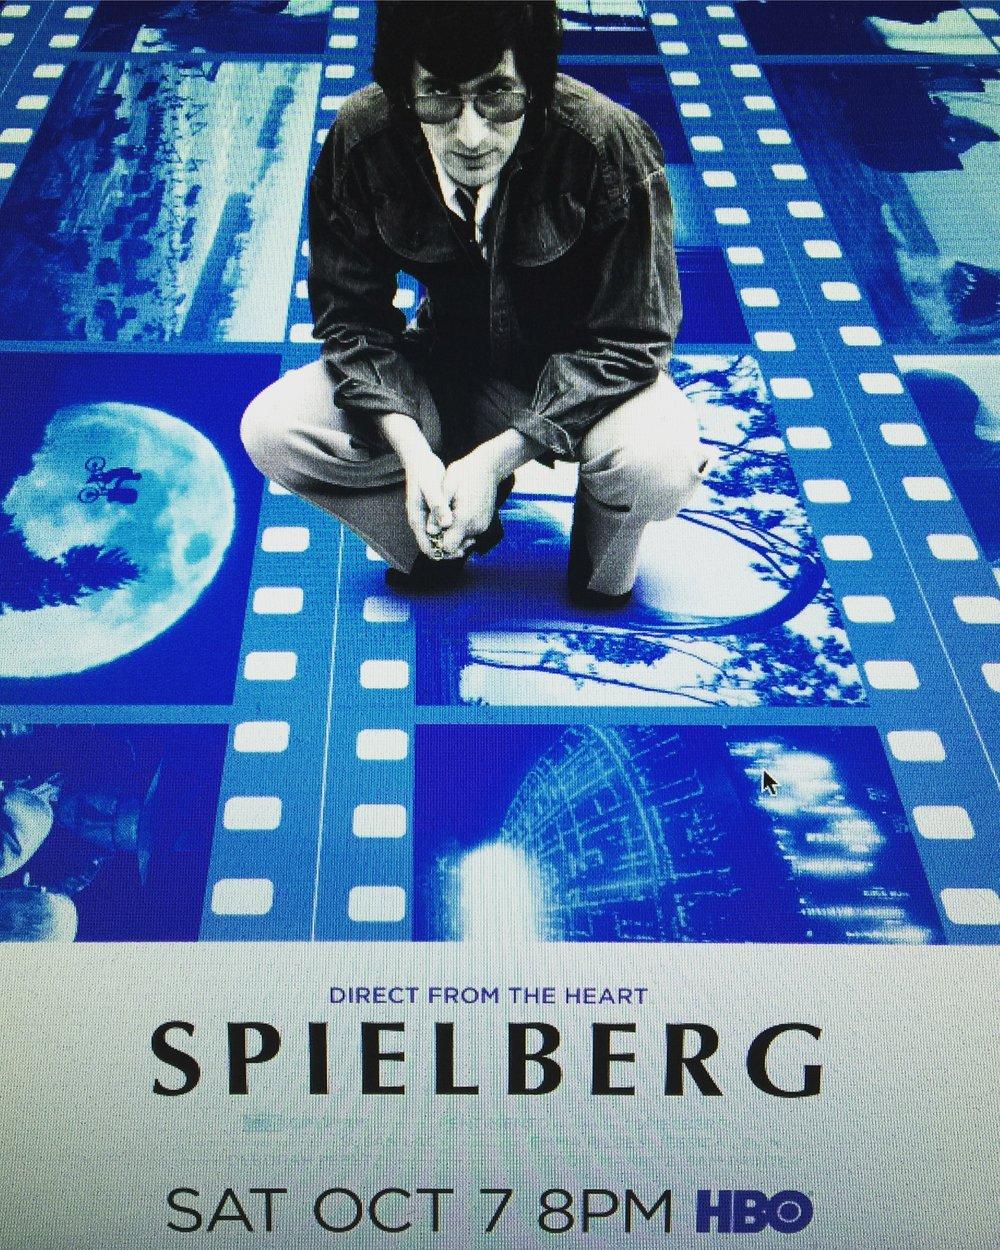 Steven Spielberg Documentary on HBO